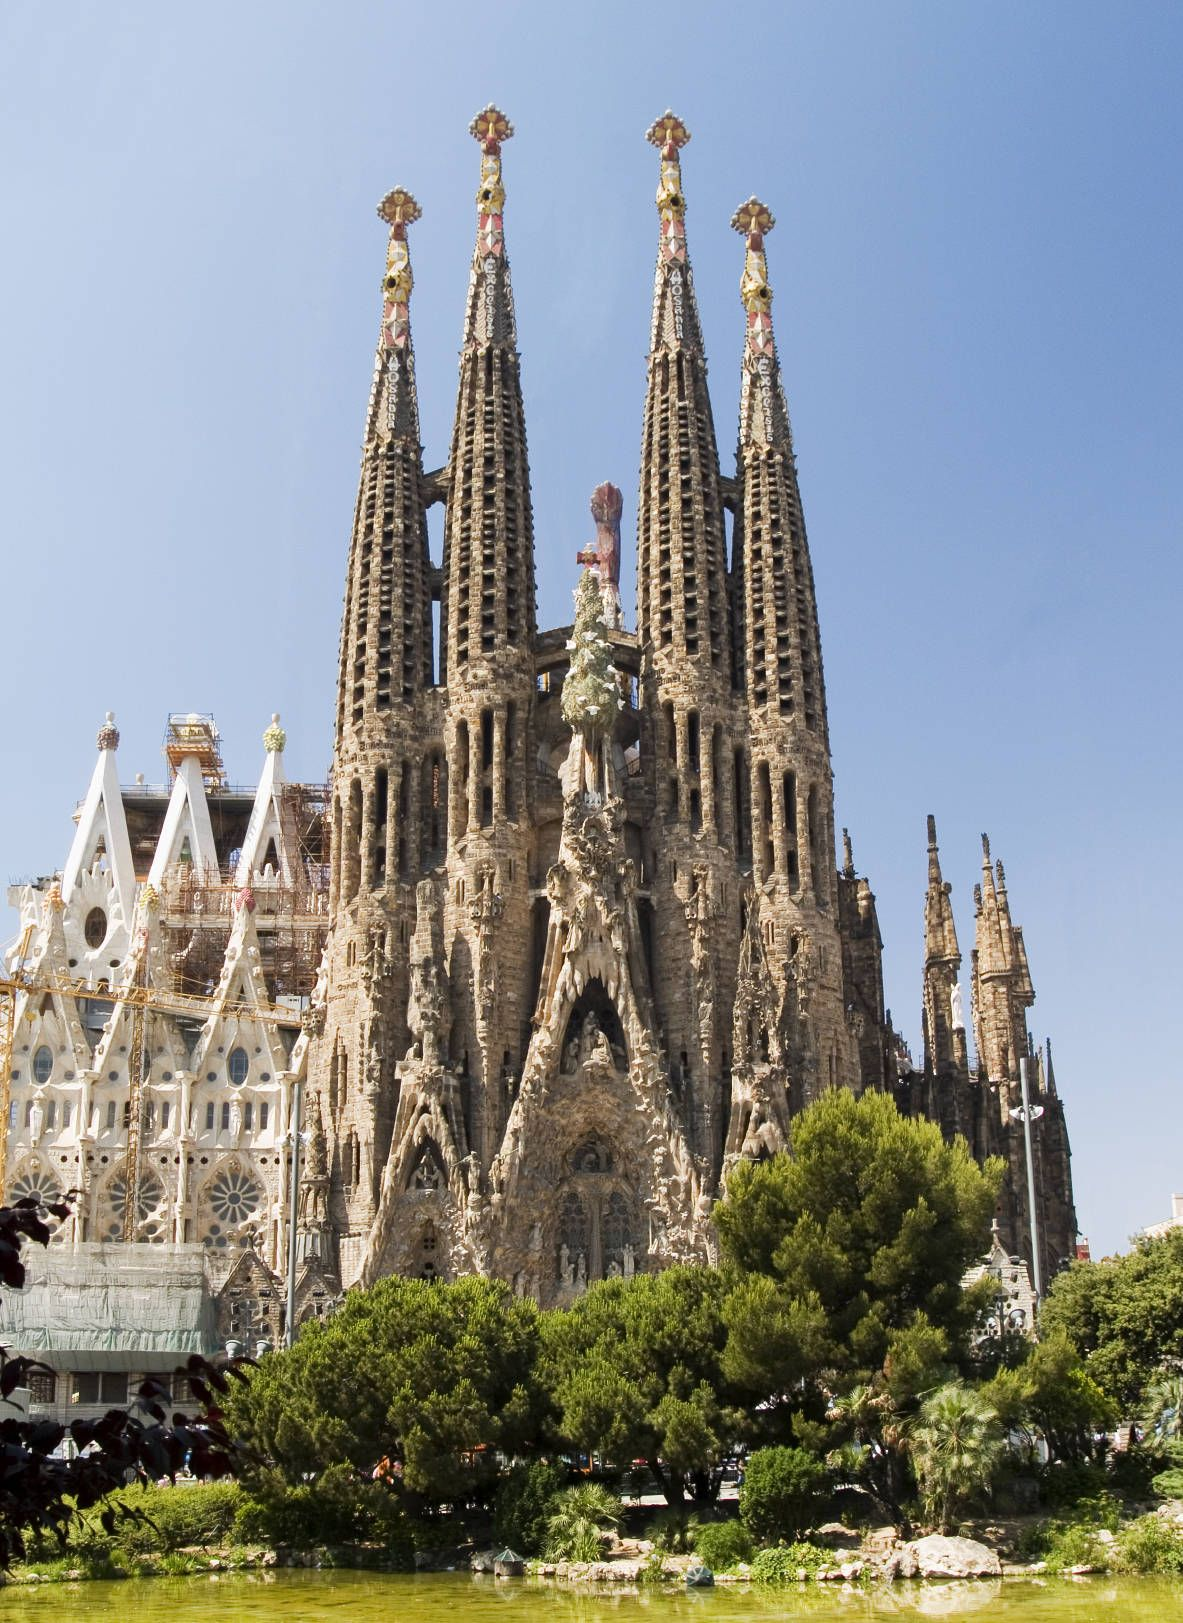 My favorite church in the world, La Sagrada Familia in Spain. Designed by one of my favorite architects Antonio Gaudi